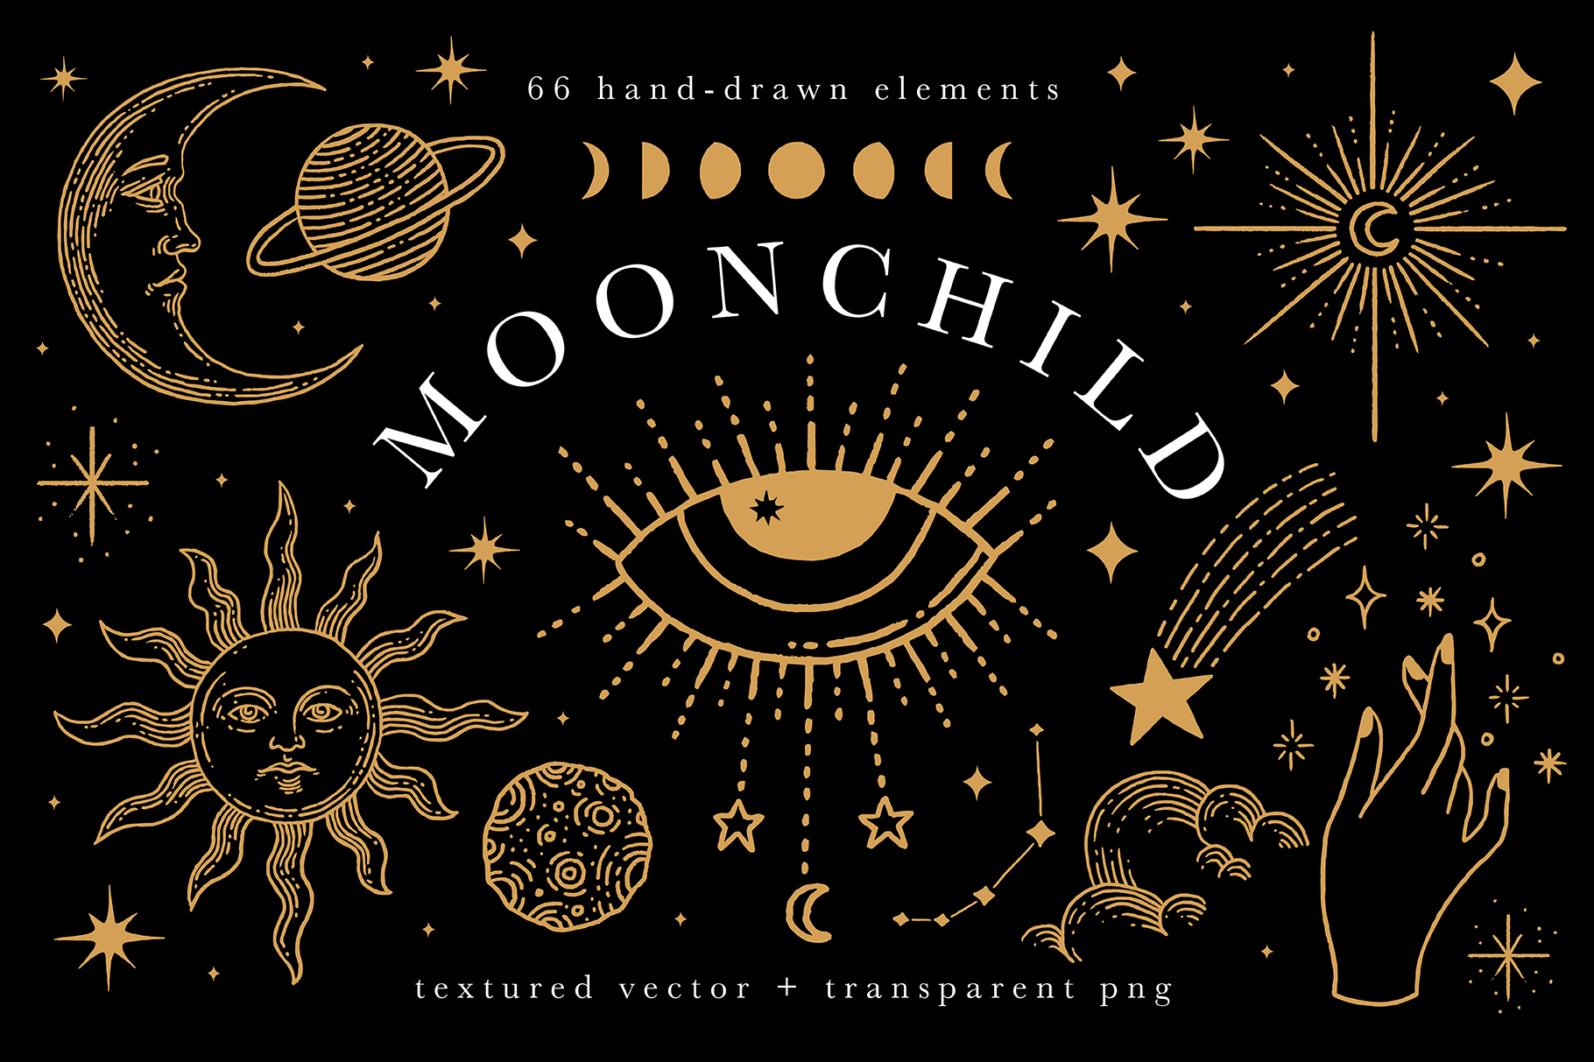 Celestial Illustration Set - Sun Moon Stars Space - Moonchild Preview 01 -